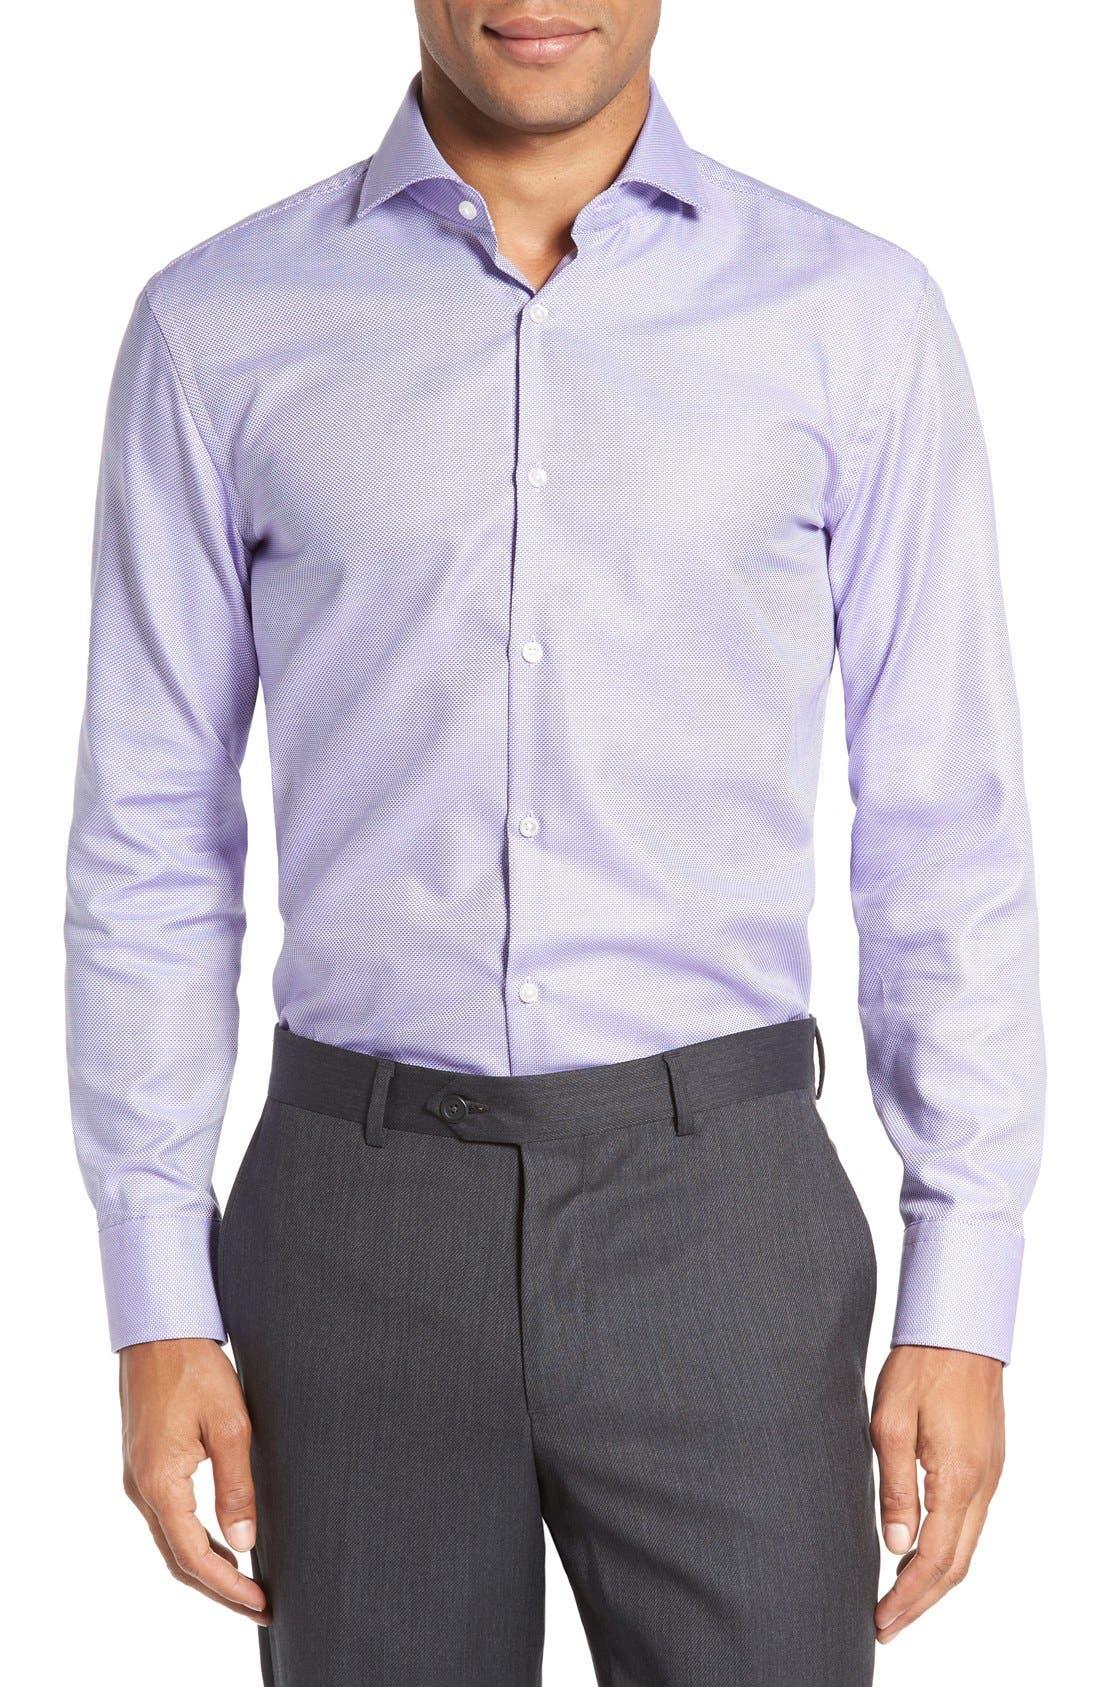 Alternate Image 1 Selected - BOSS Sharp Fit Dress Shirt